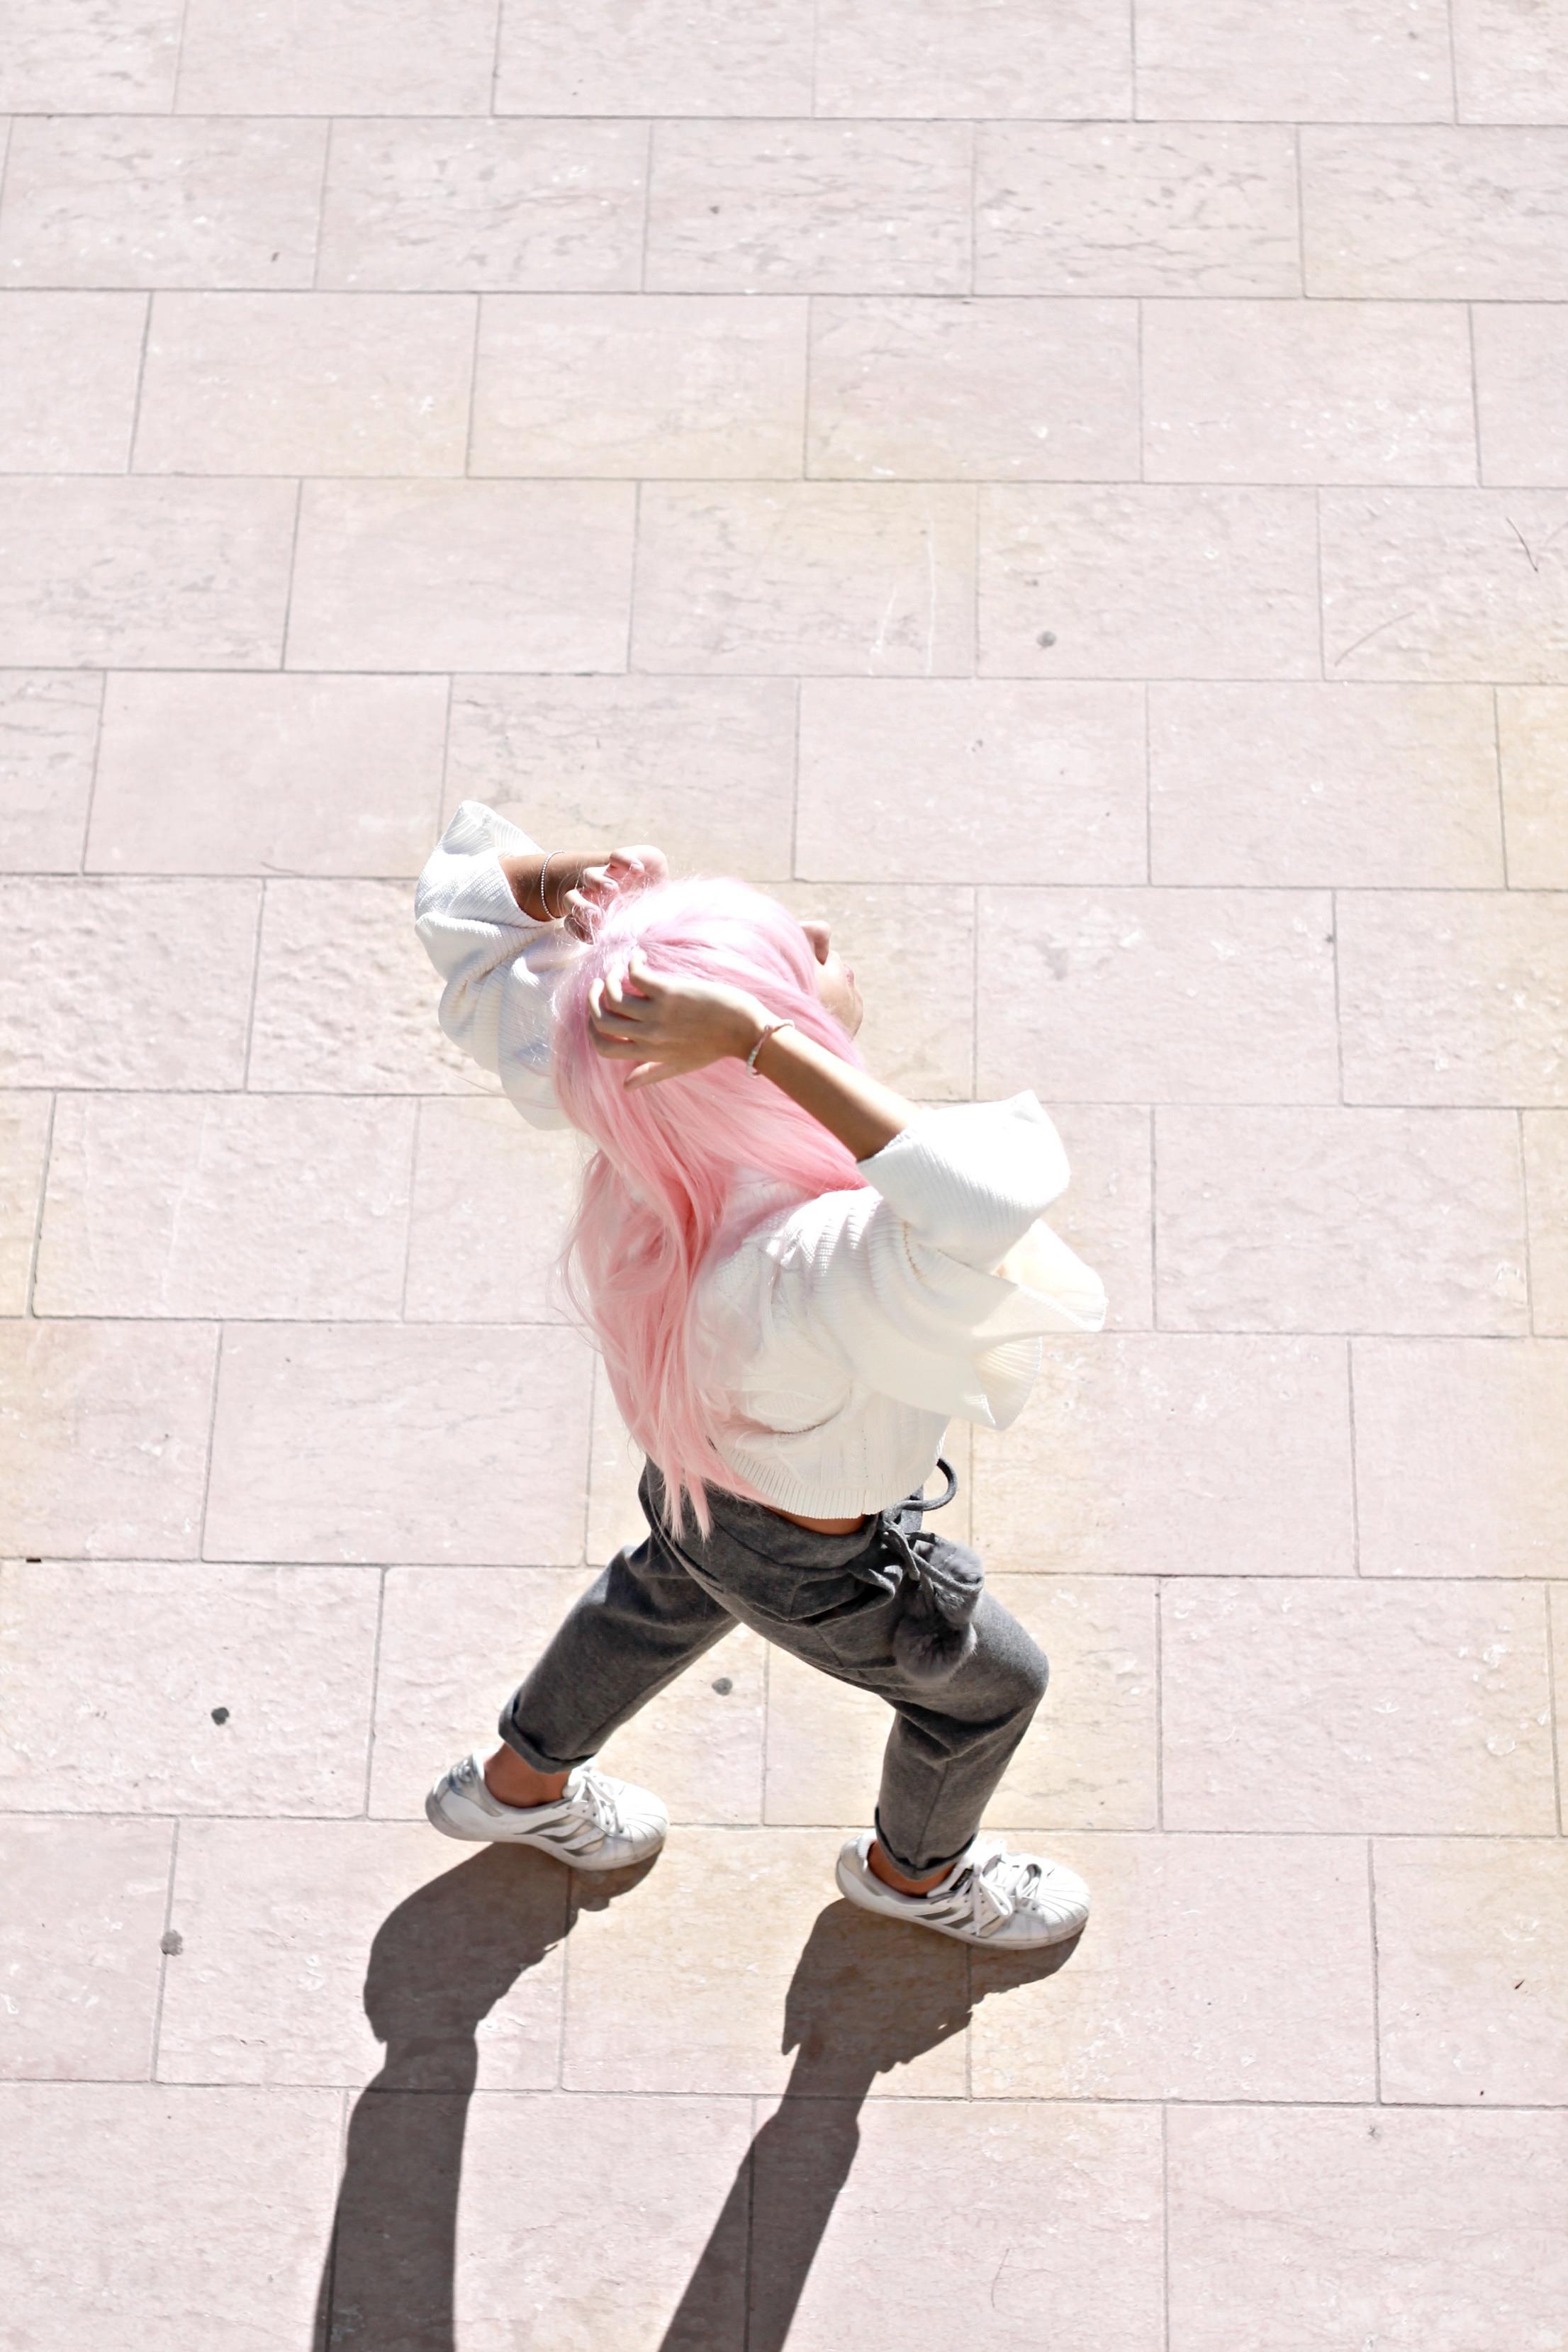 successo fast fashion, manga style blogger, capelli rosa blogger moda, casual chic look autunno inverno 2016, casual chic outfit blogger fall winter 2016, theladycracy.it, elisa bellino, fashion blogger instagram 2016, fashion blogger famose 2016, fashion italiane famose 2016, fashion blogger più seguite 2016, fashion blog 2016, fashion blogger italia 2016, fashion blogger outfit autunno inverno 2016, fashion blogger milano 2016, i love friday outfit, i love friday clothes, sporty chic outfit fall winter 2016, sporty chic look fall 2016, sporty chic blogger 2016, come vestirsi casual inverno 2016, come vestirsi sportive chic autunno inverno 2016, cosa va di moda inverno 2016, pom pom trend 2016